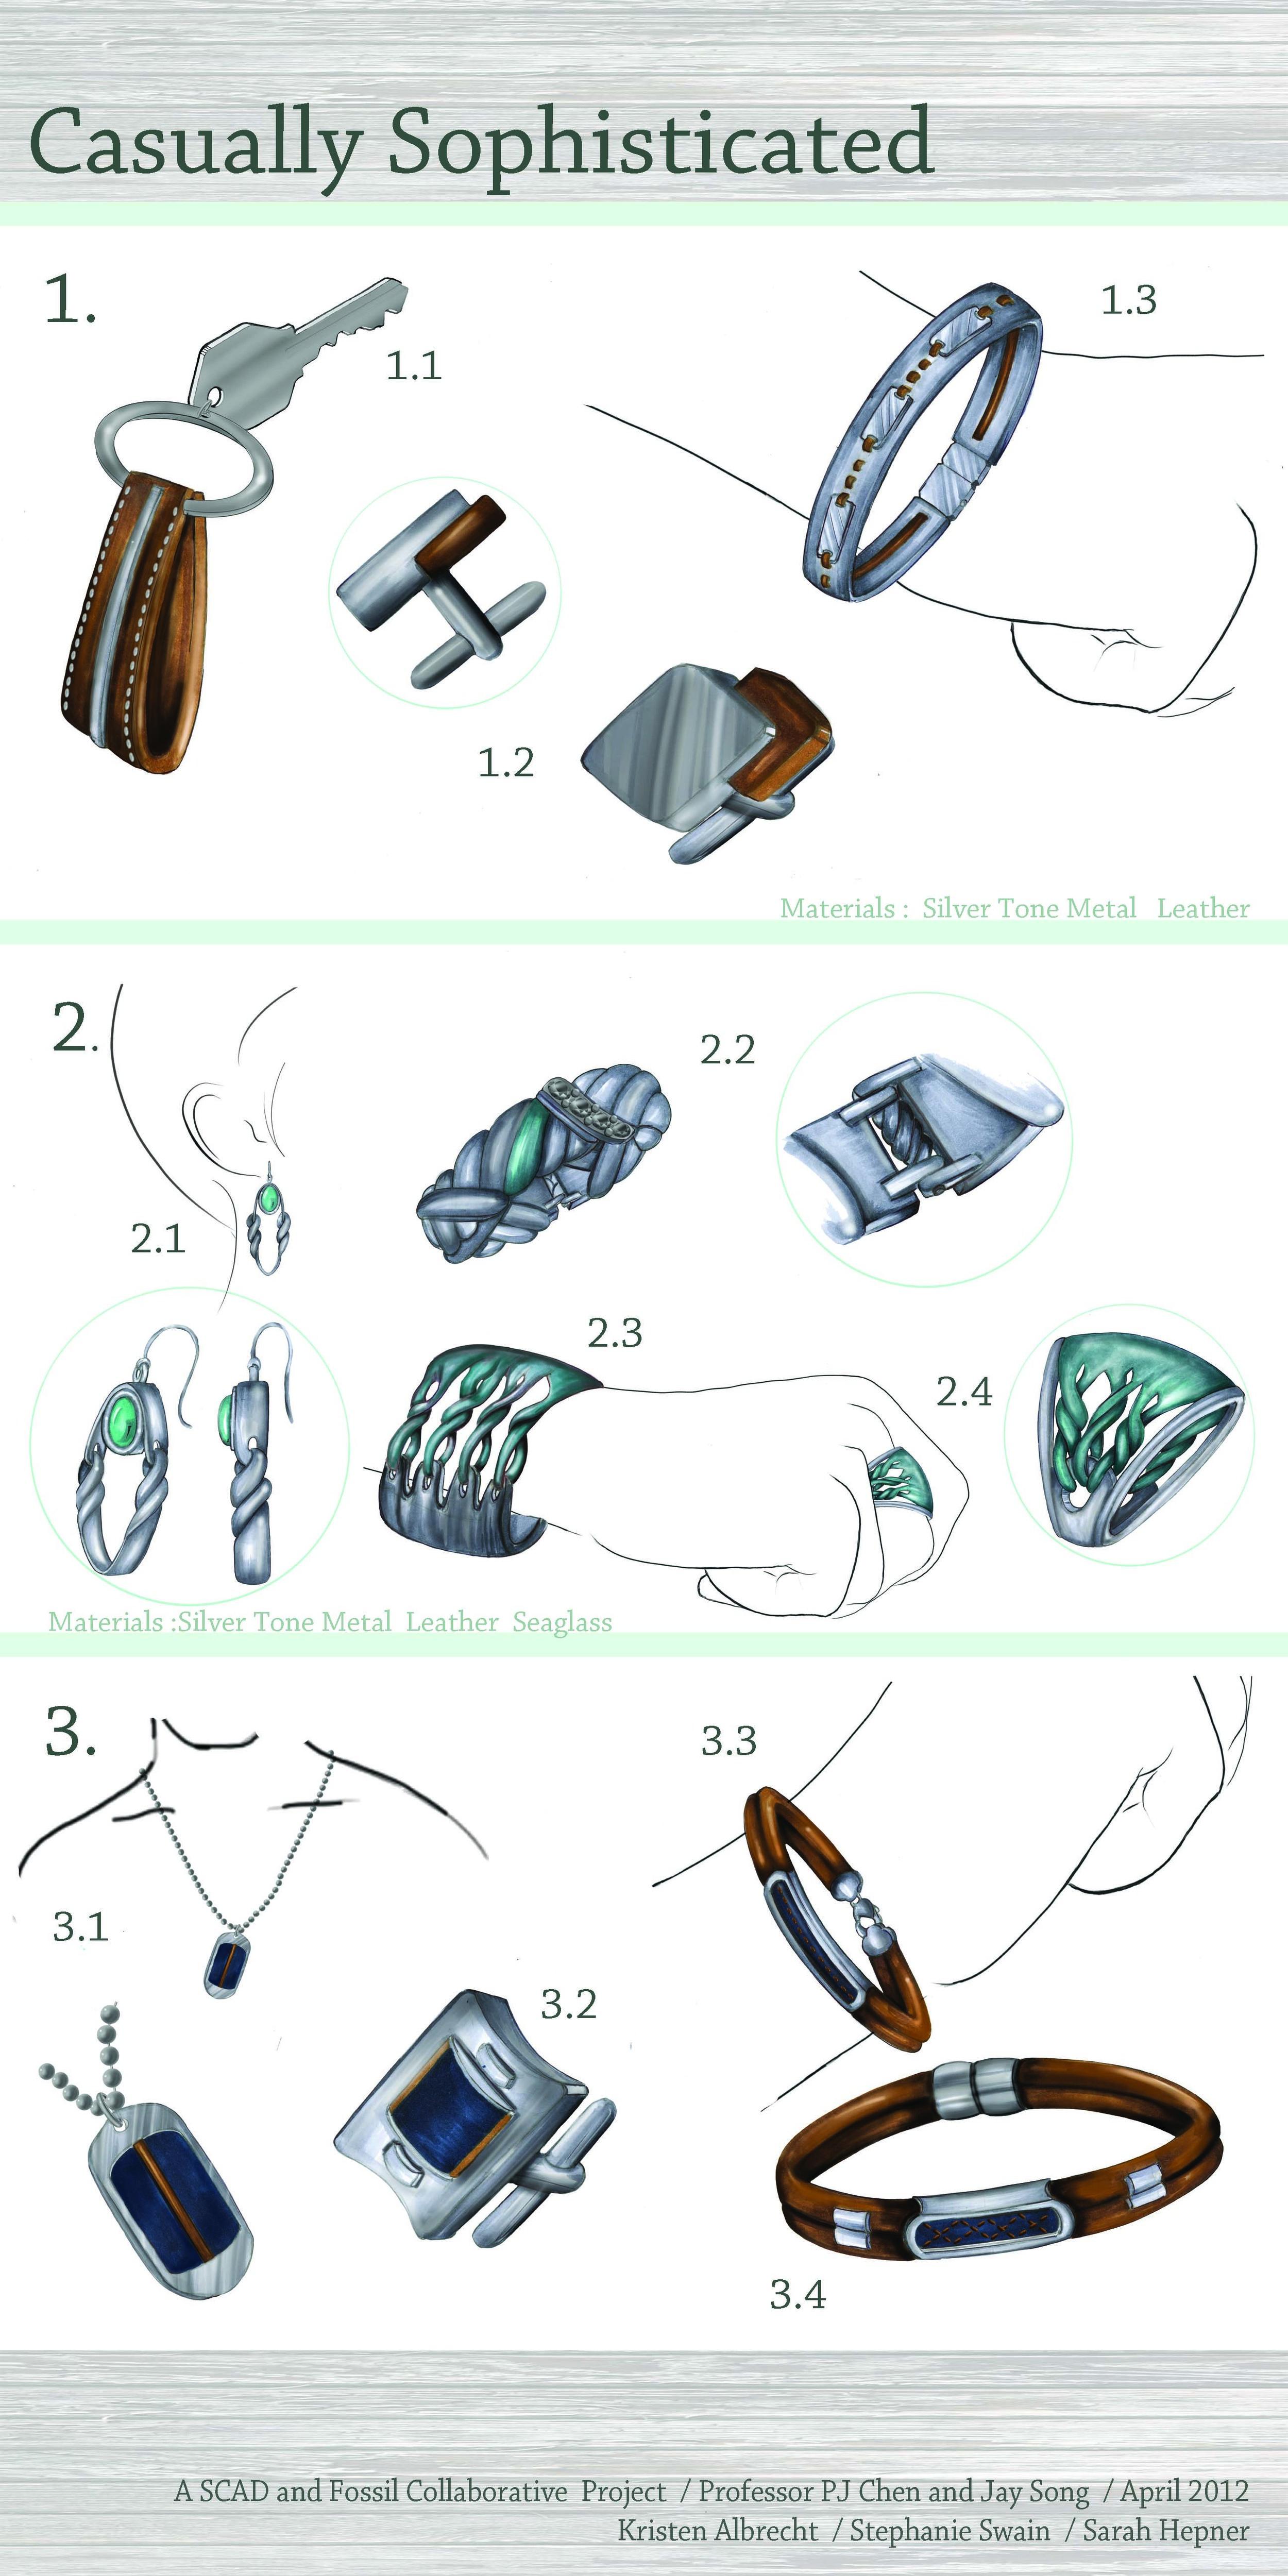 Casually Sophisticated Design (Stephanie).jpg